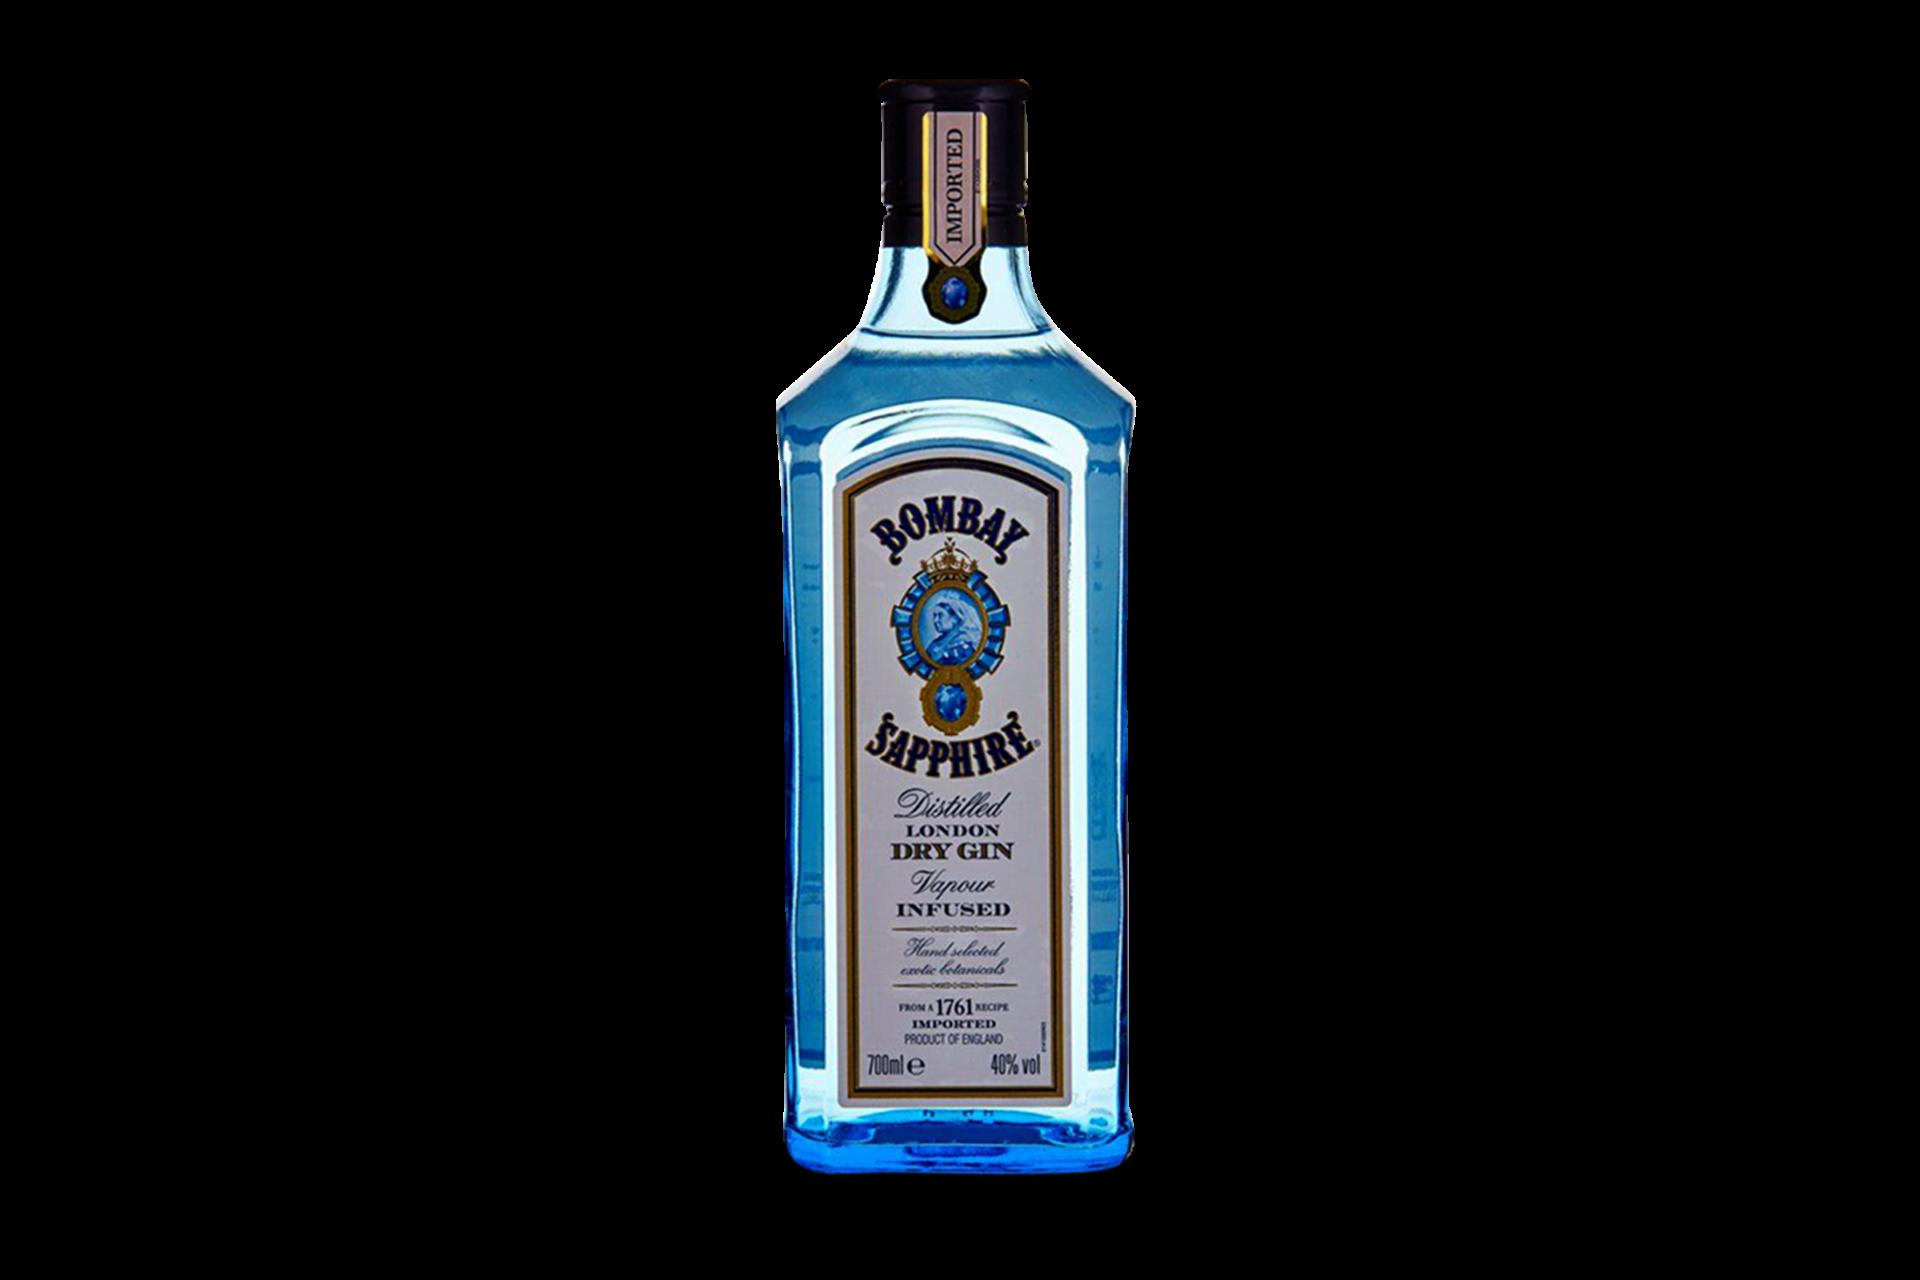 Bombay Sapphire London Gin 0.7 l 1